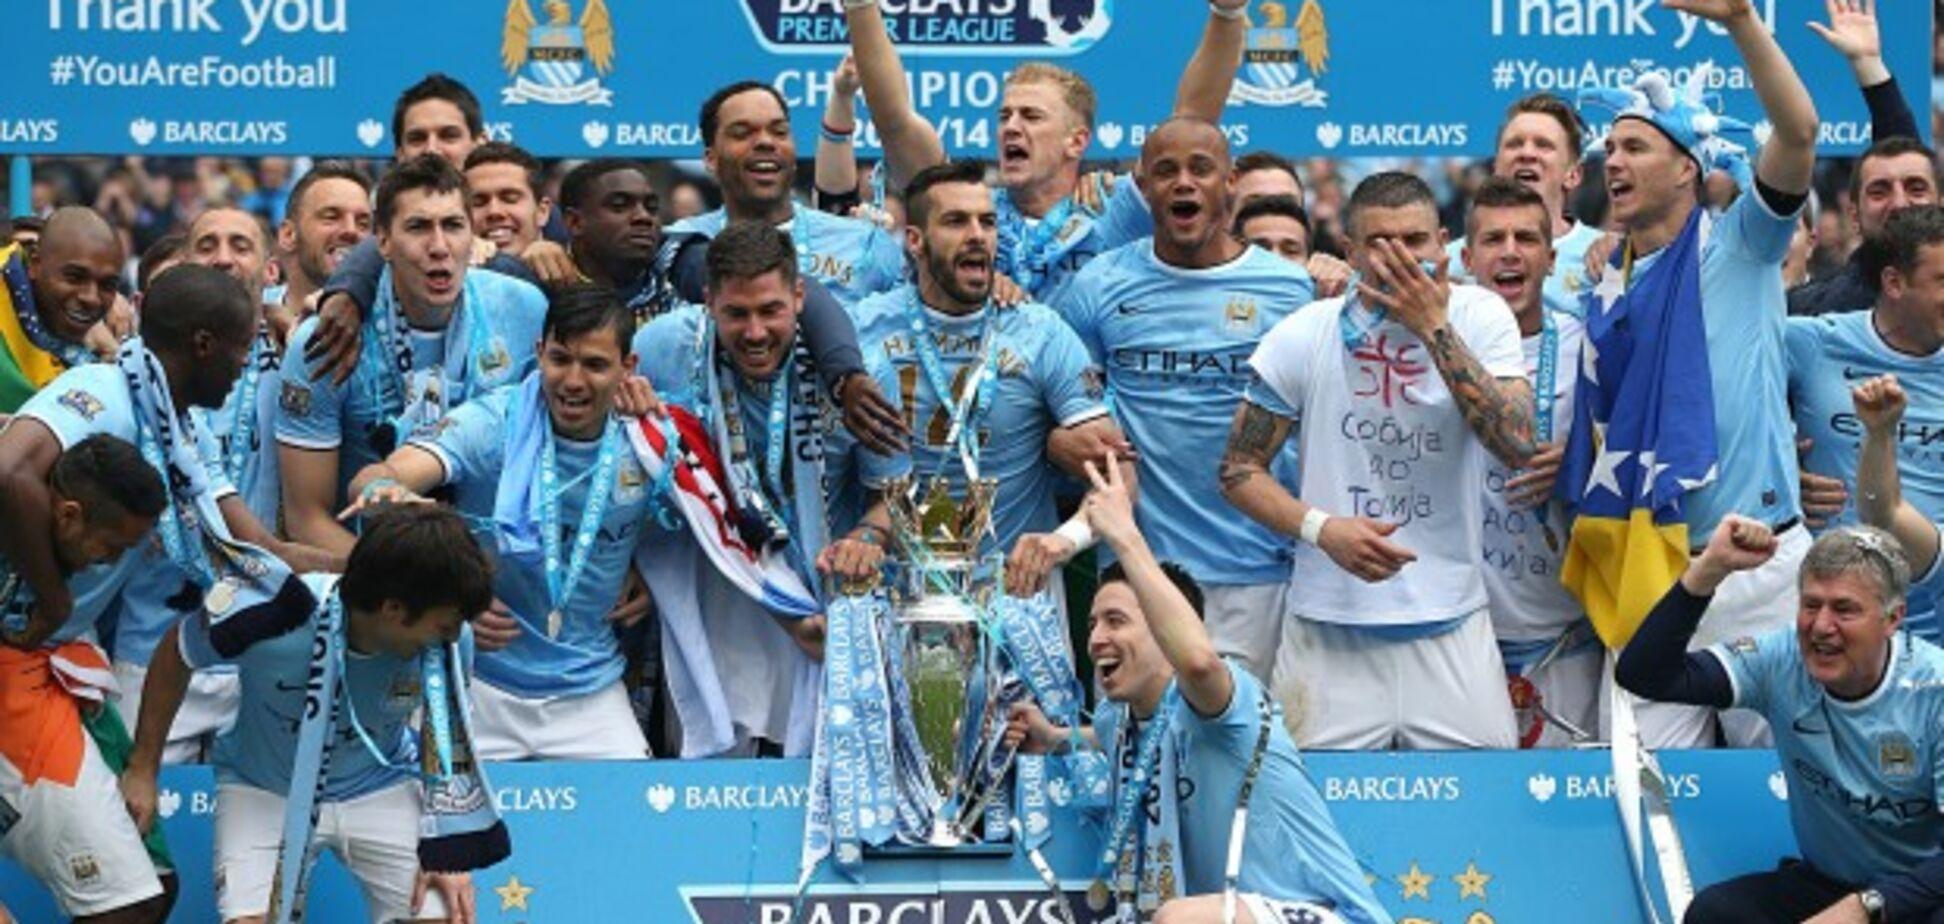 Игроки 'Манчестер Сити' празднуют победу в АПЛ в сезоне 2013/14